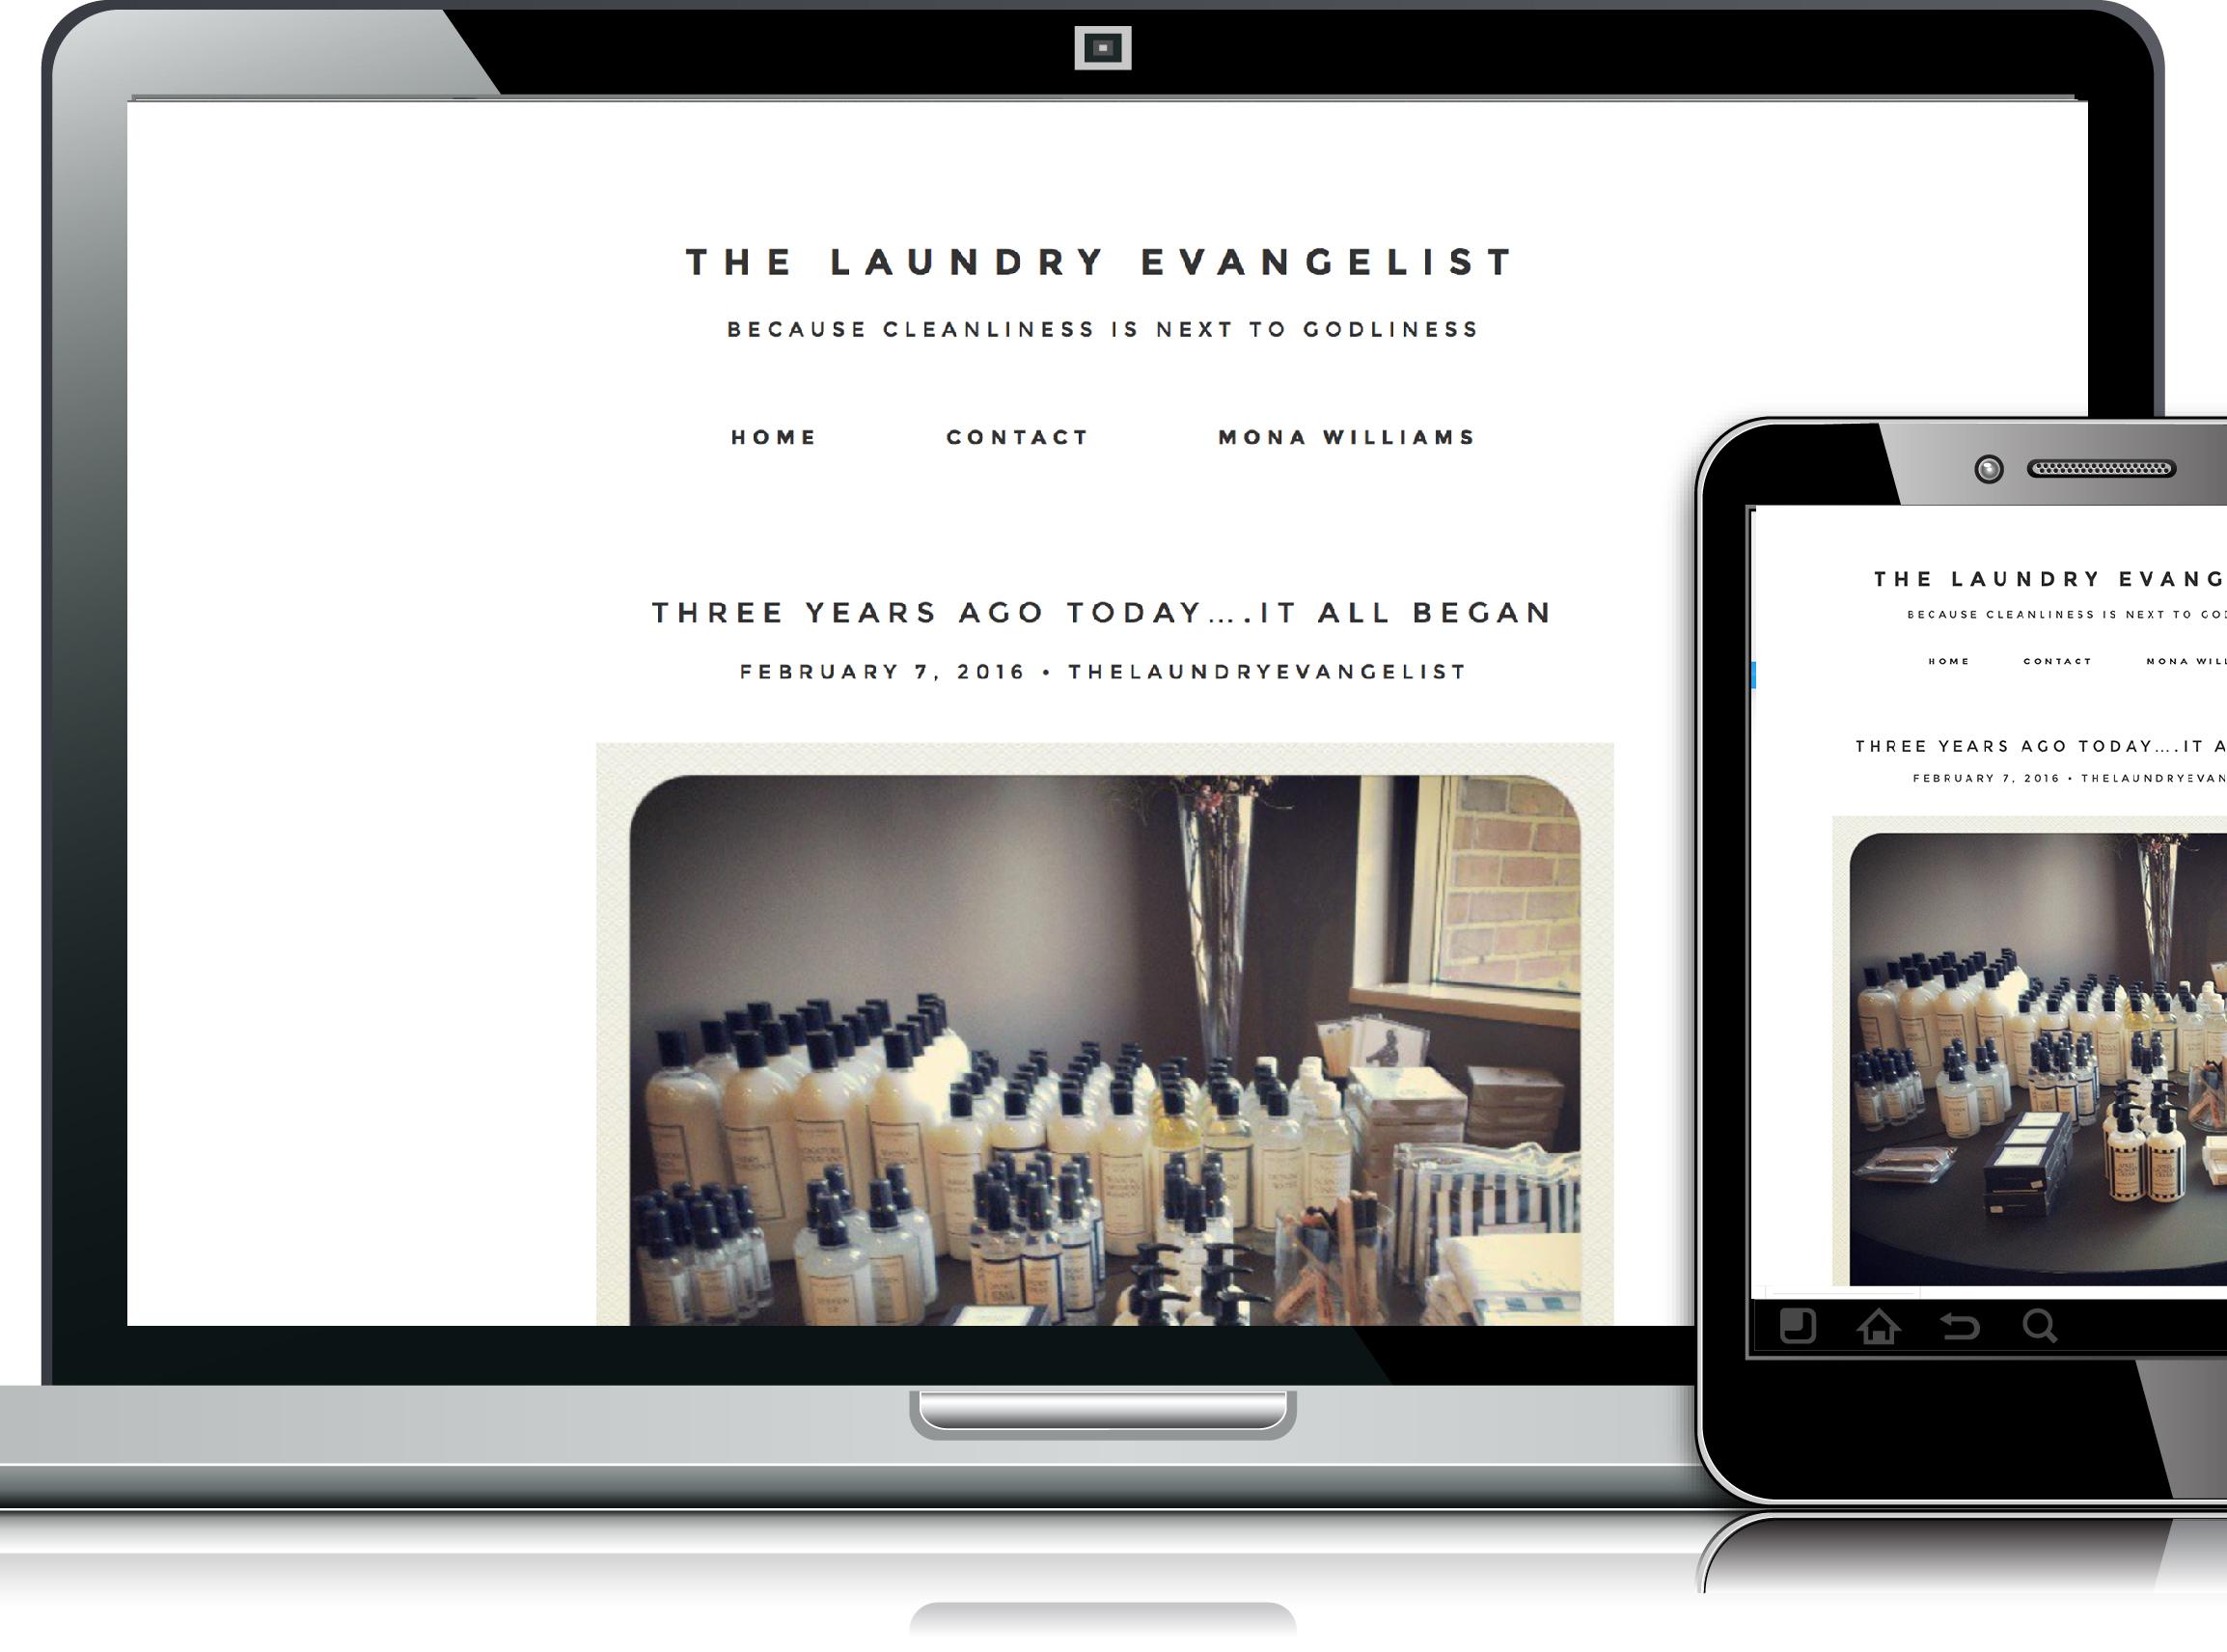 laundry evangelist web design website layouts